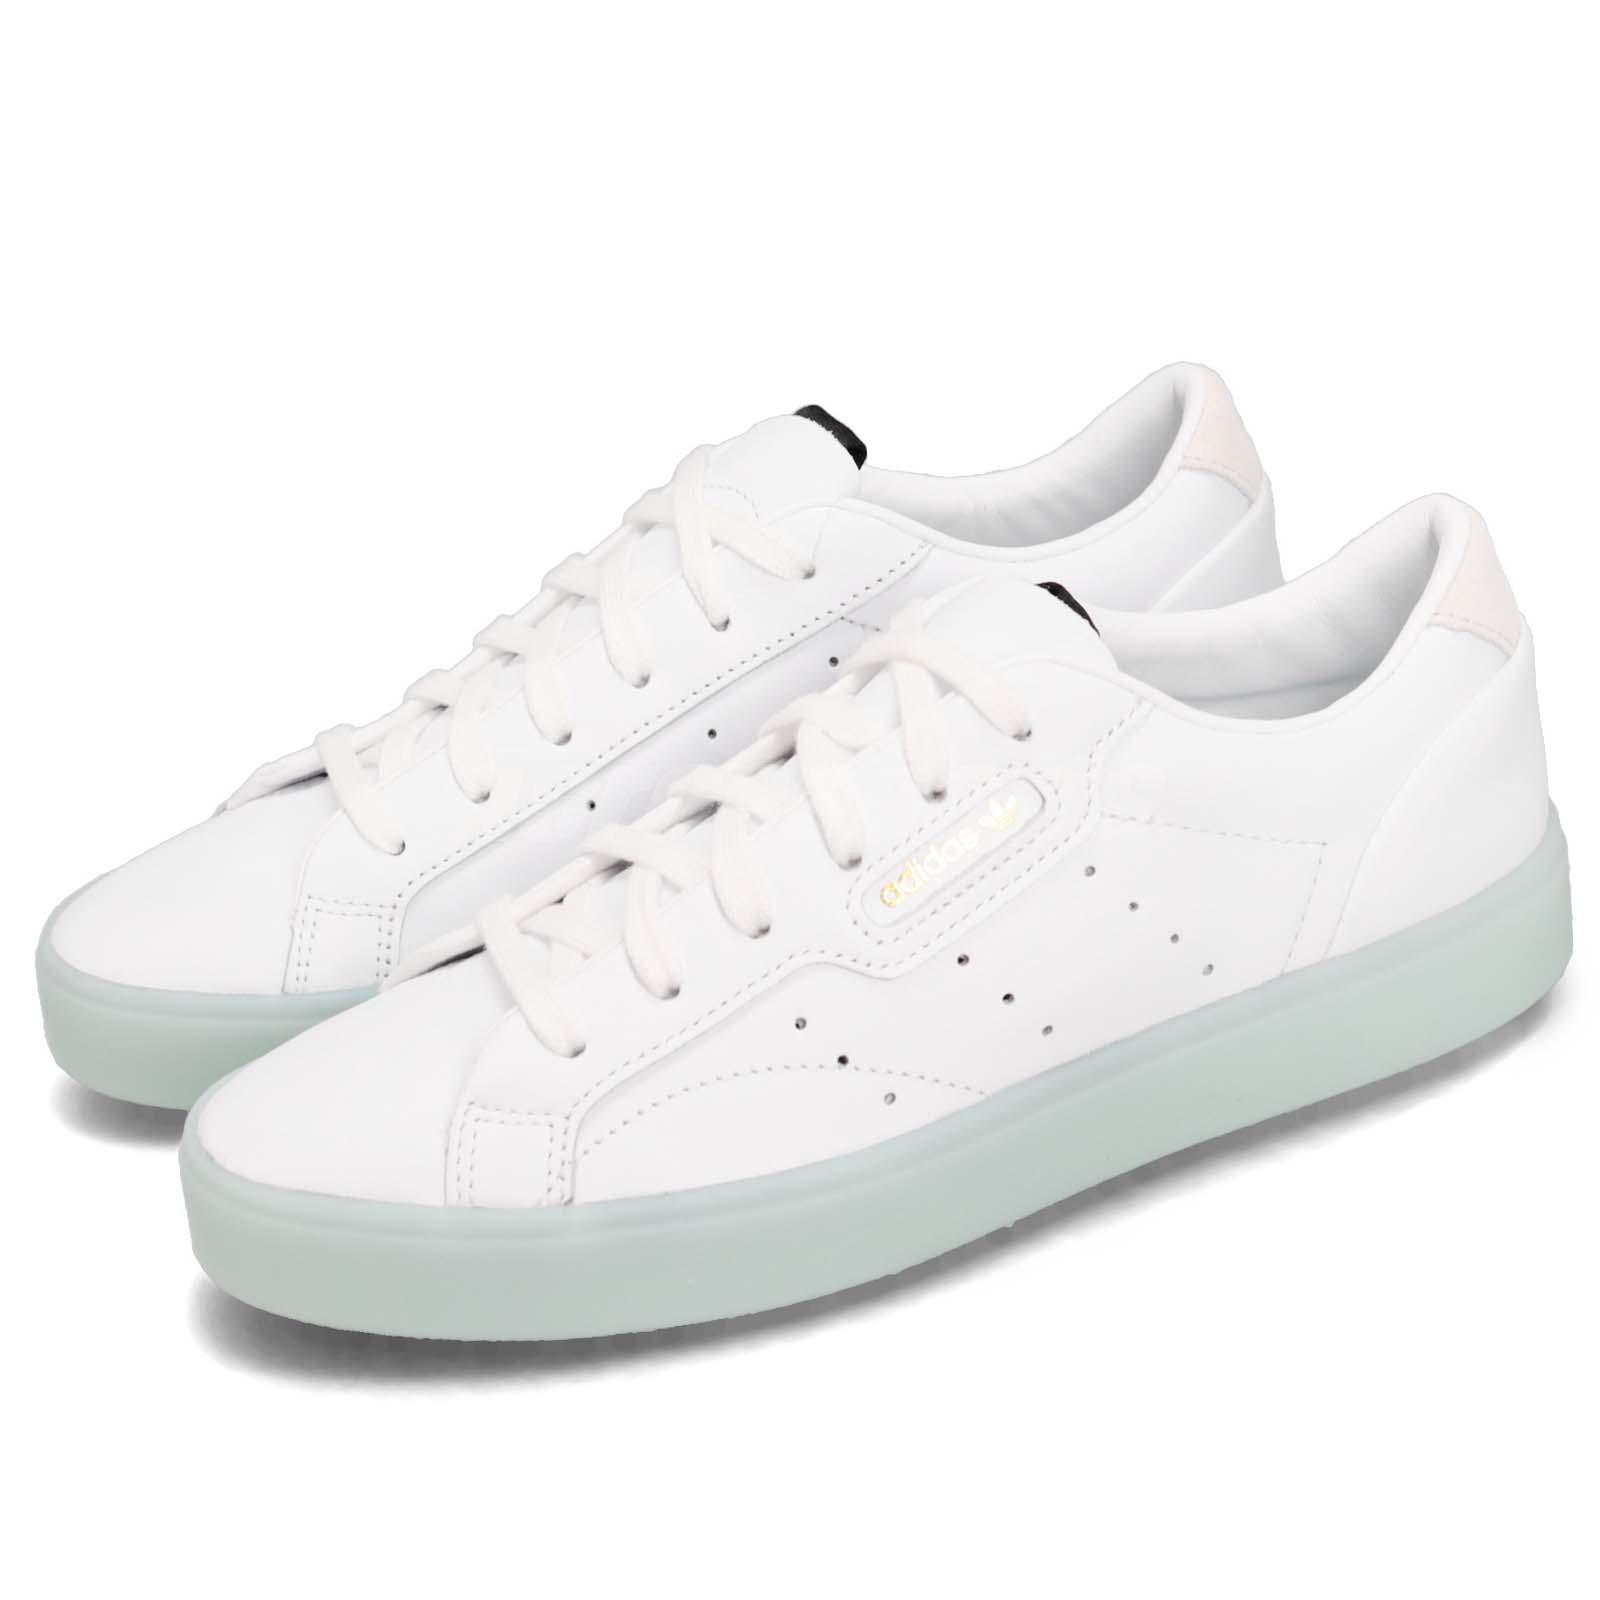 dedd6597 Details about adidas Originals SLEEK W White Ice Mint Women Casual  Lifestyle Shoes G27342